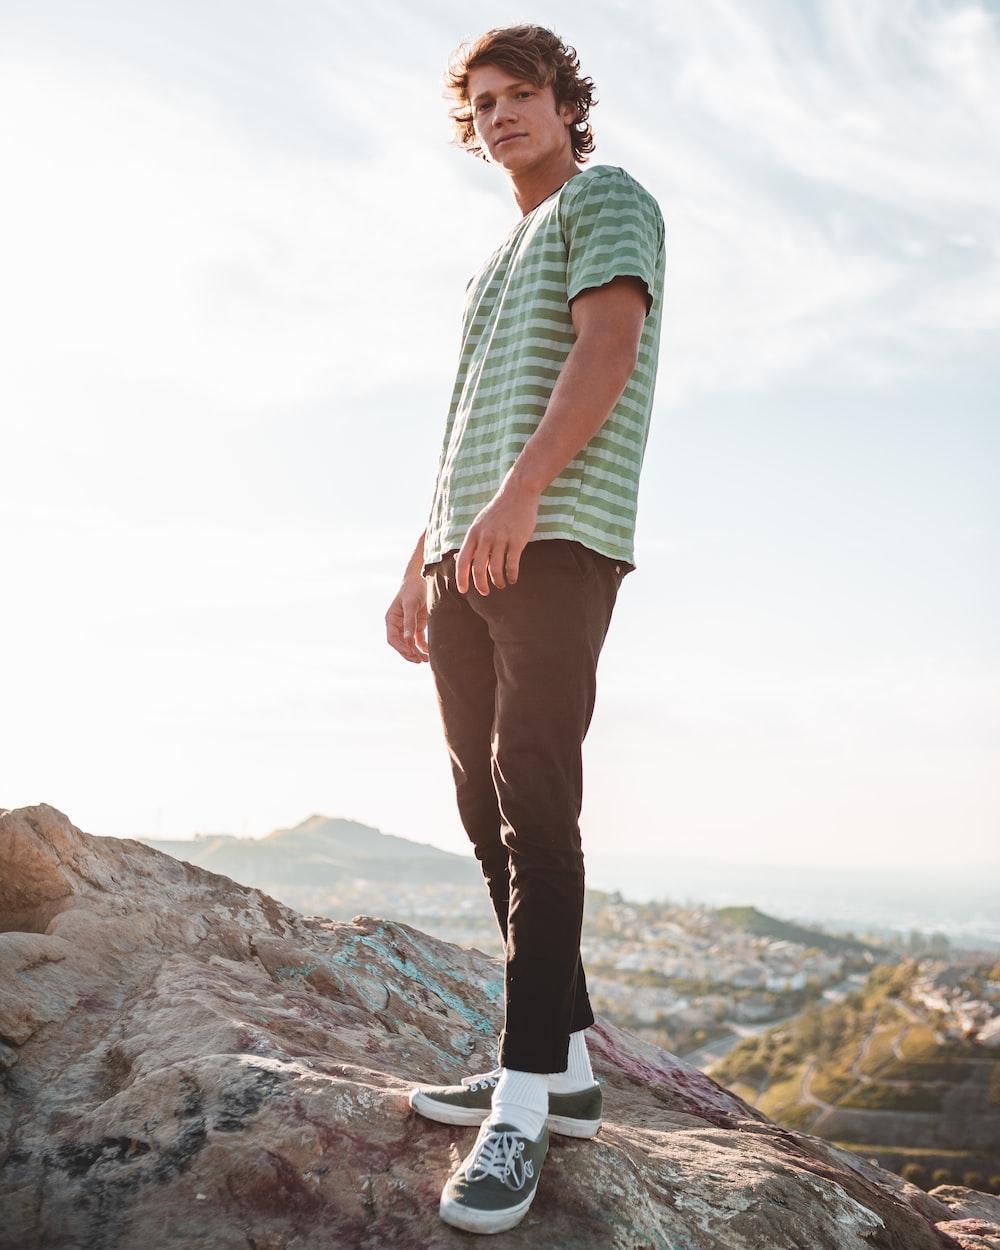 man wearing t-shirt standing on rock